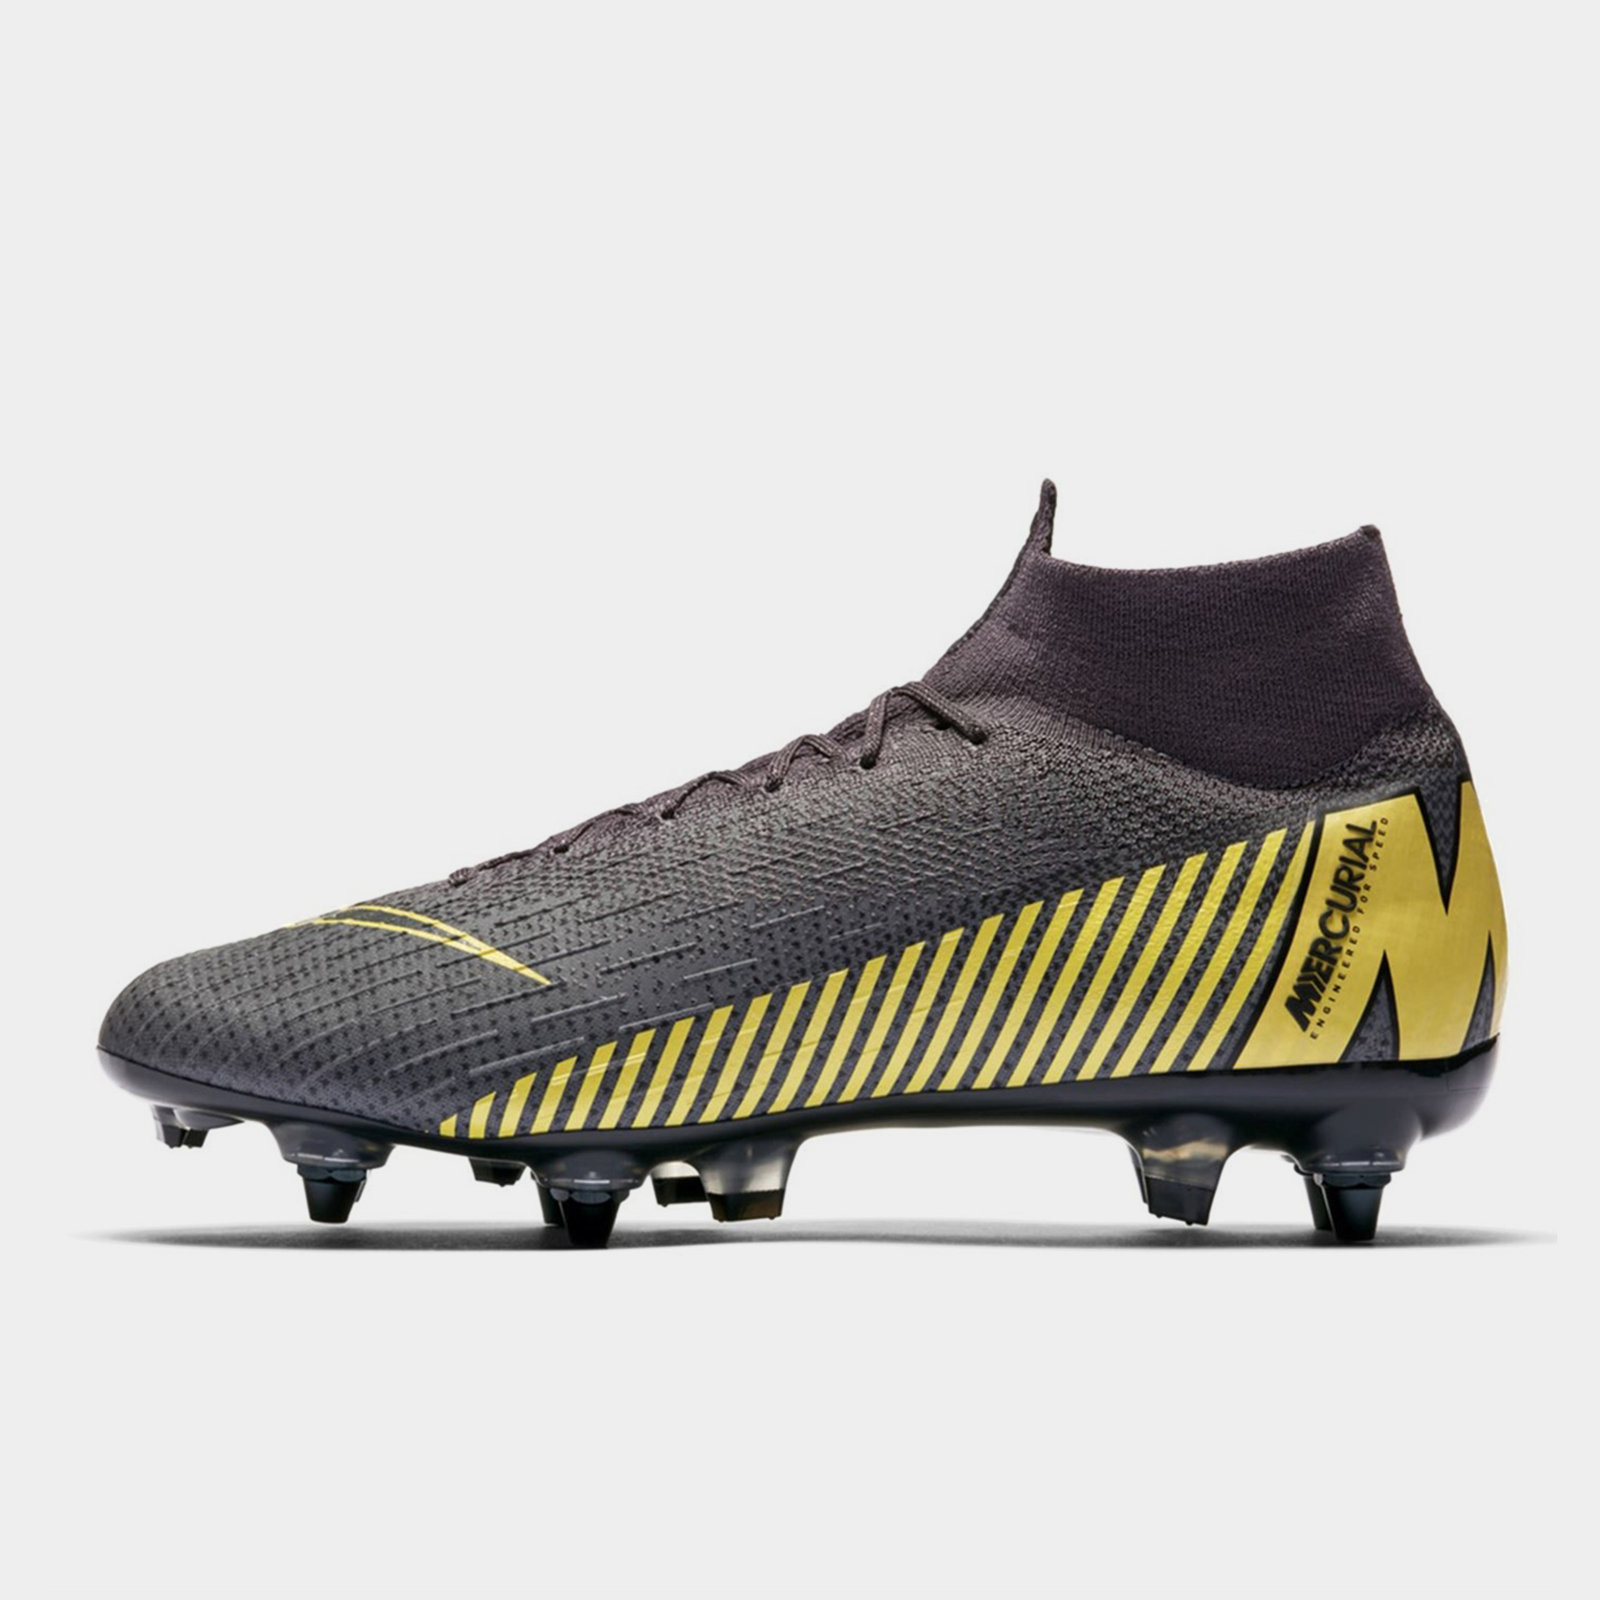 Mercurial Superfly Elite DF Mens SG Football Boots - DUPLICATE